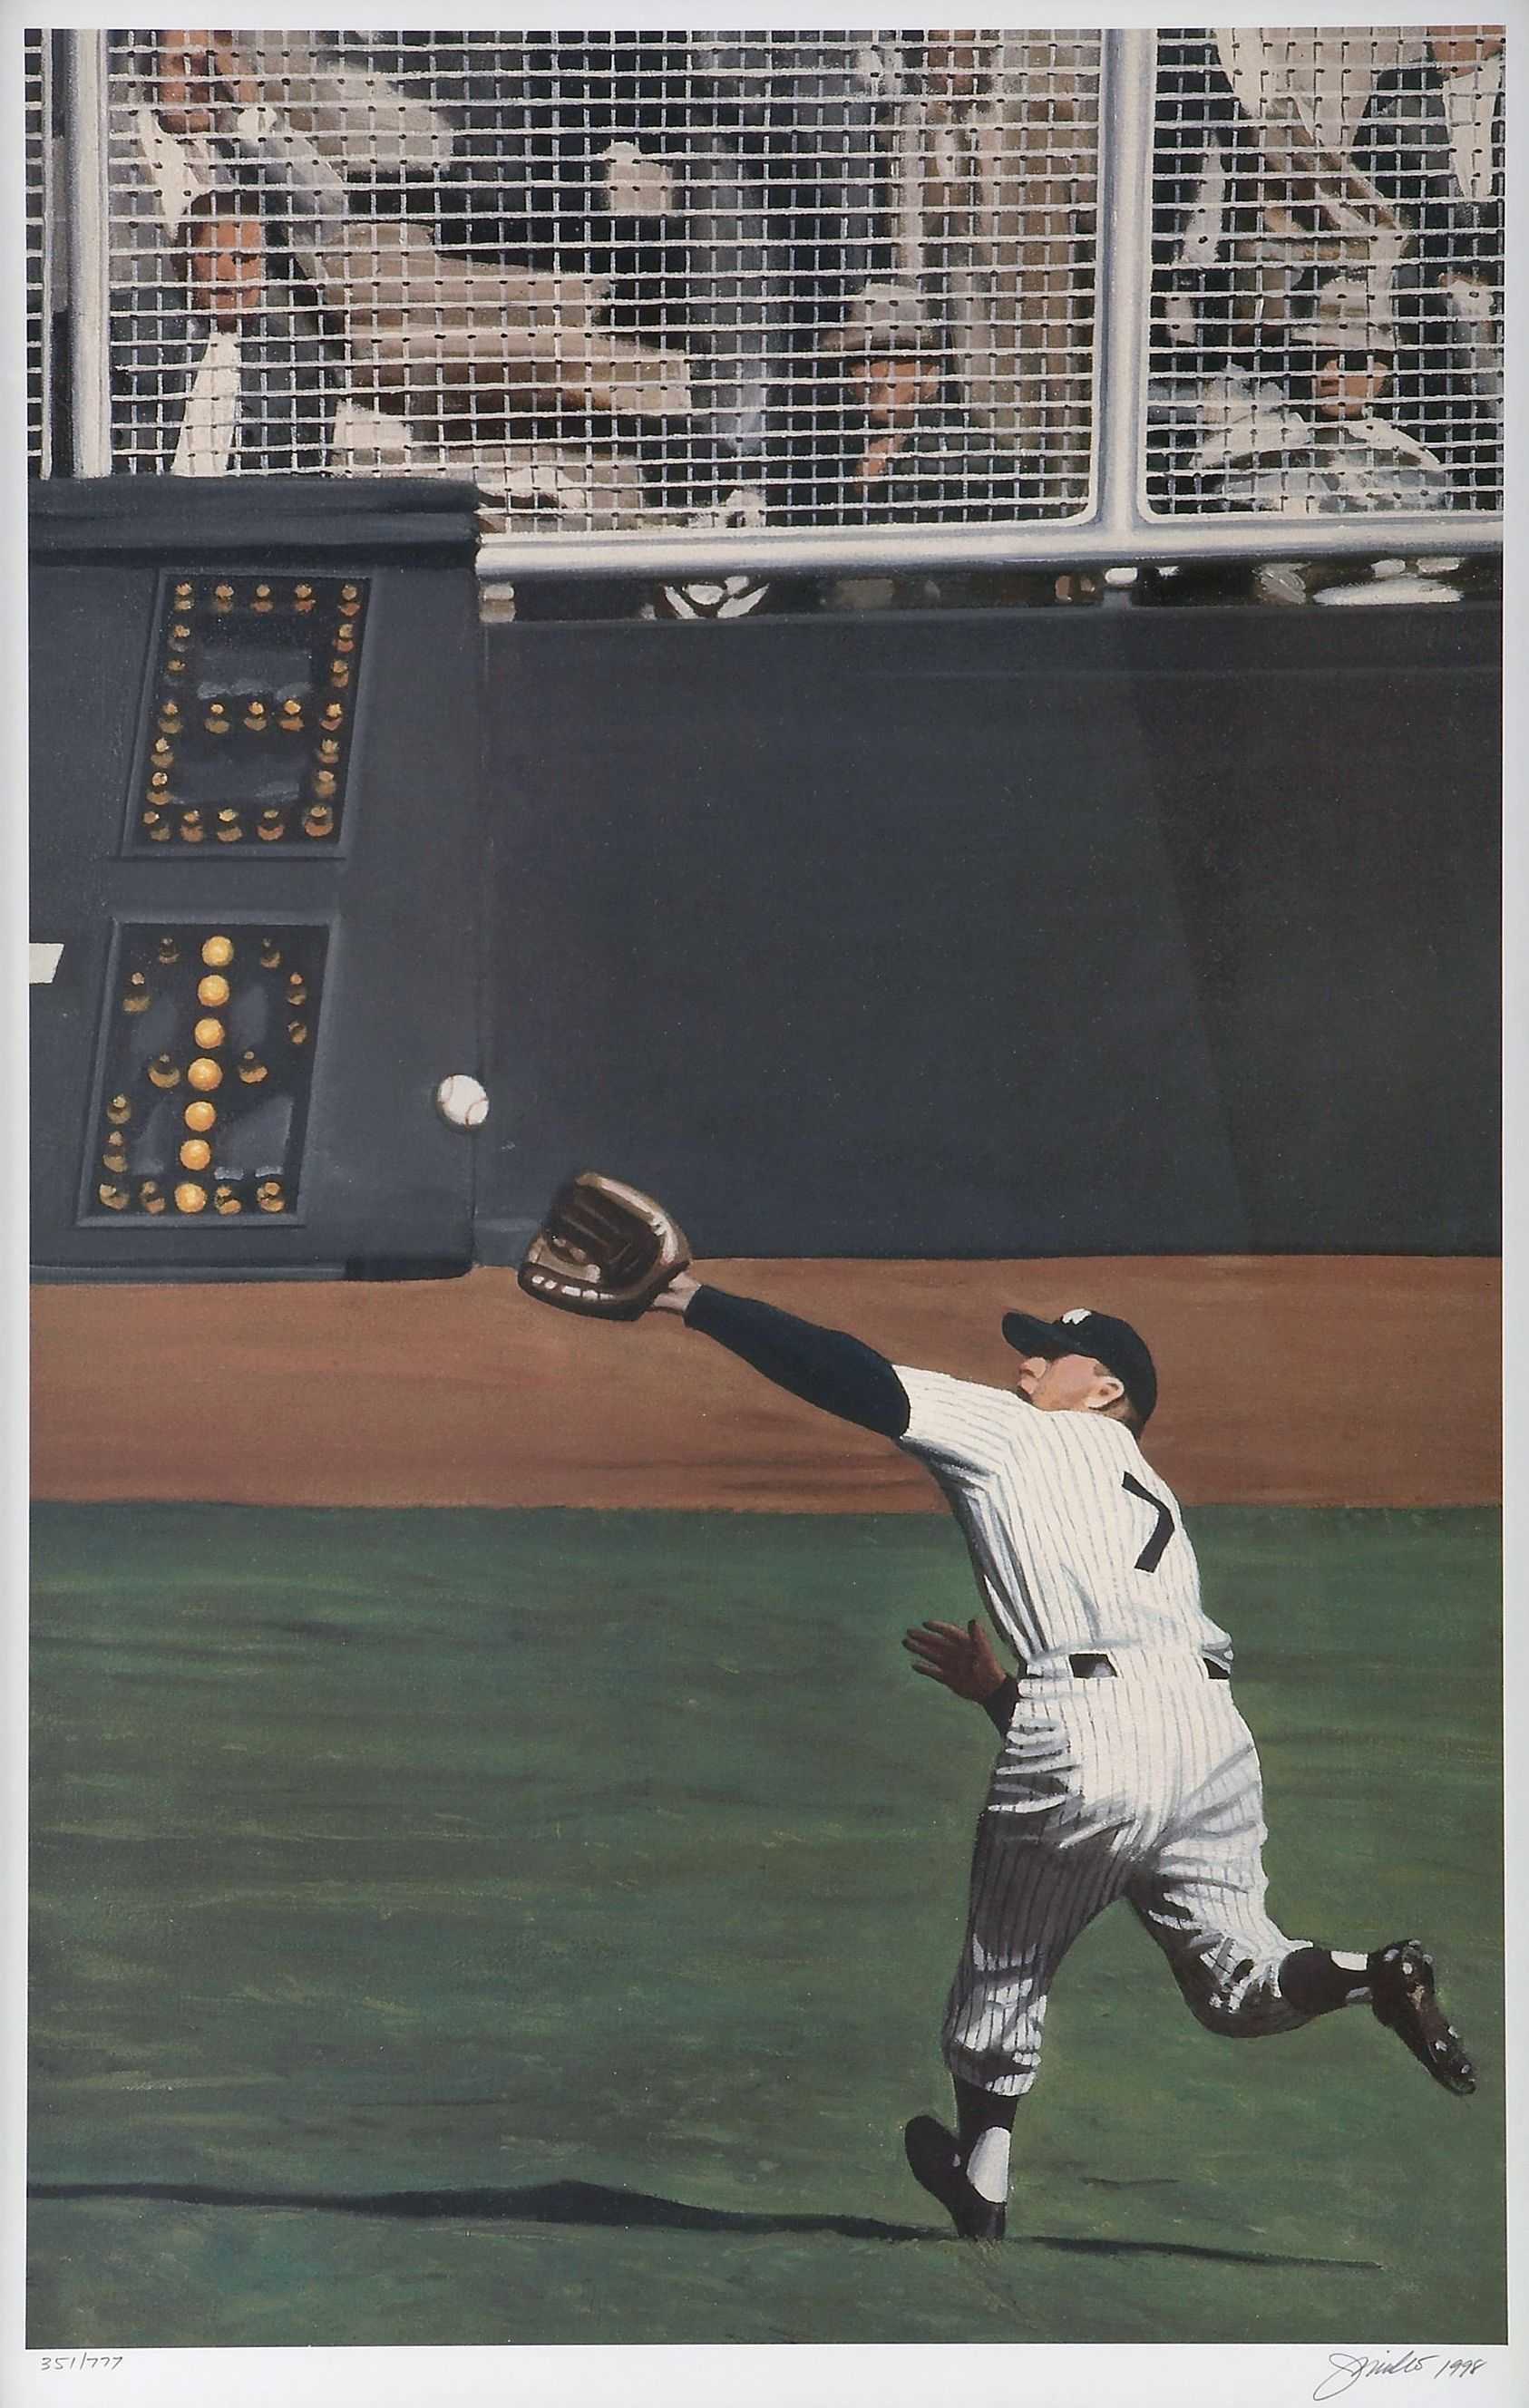 1998 Mickey Mantle Perfect Catch By Andy Jurinko Mickey Mantle Baseball Yankees Baseball